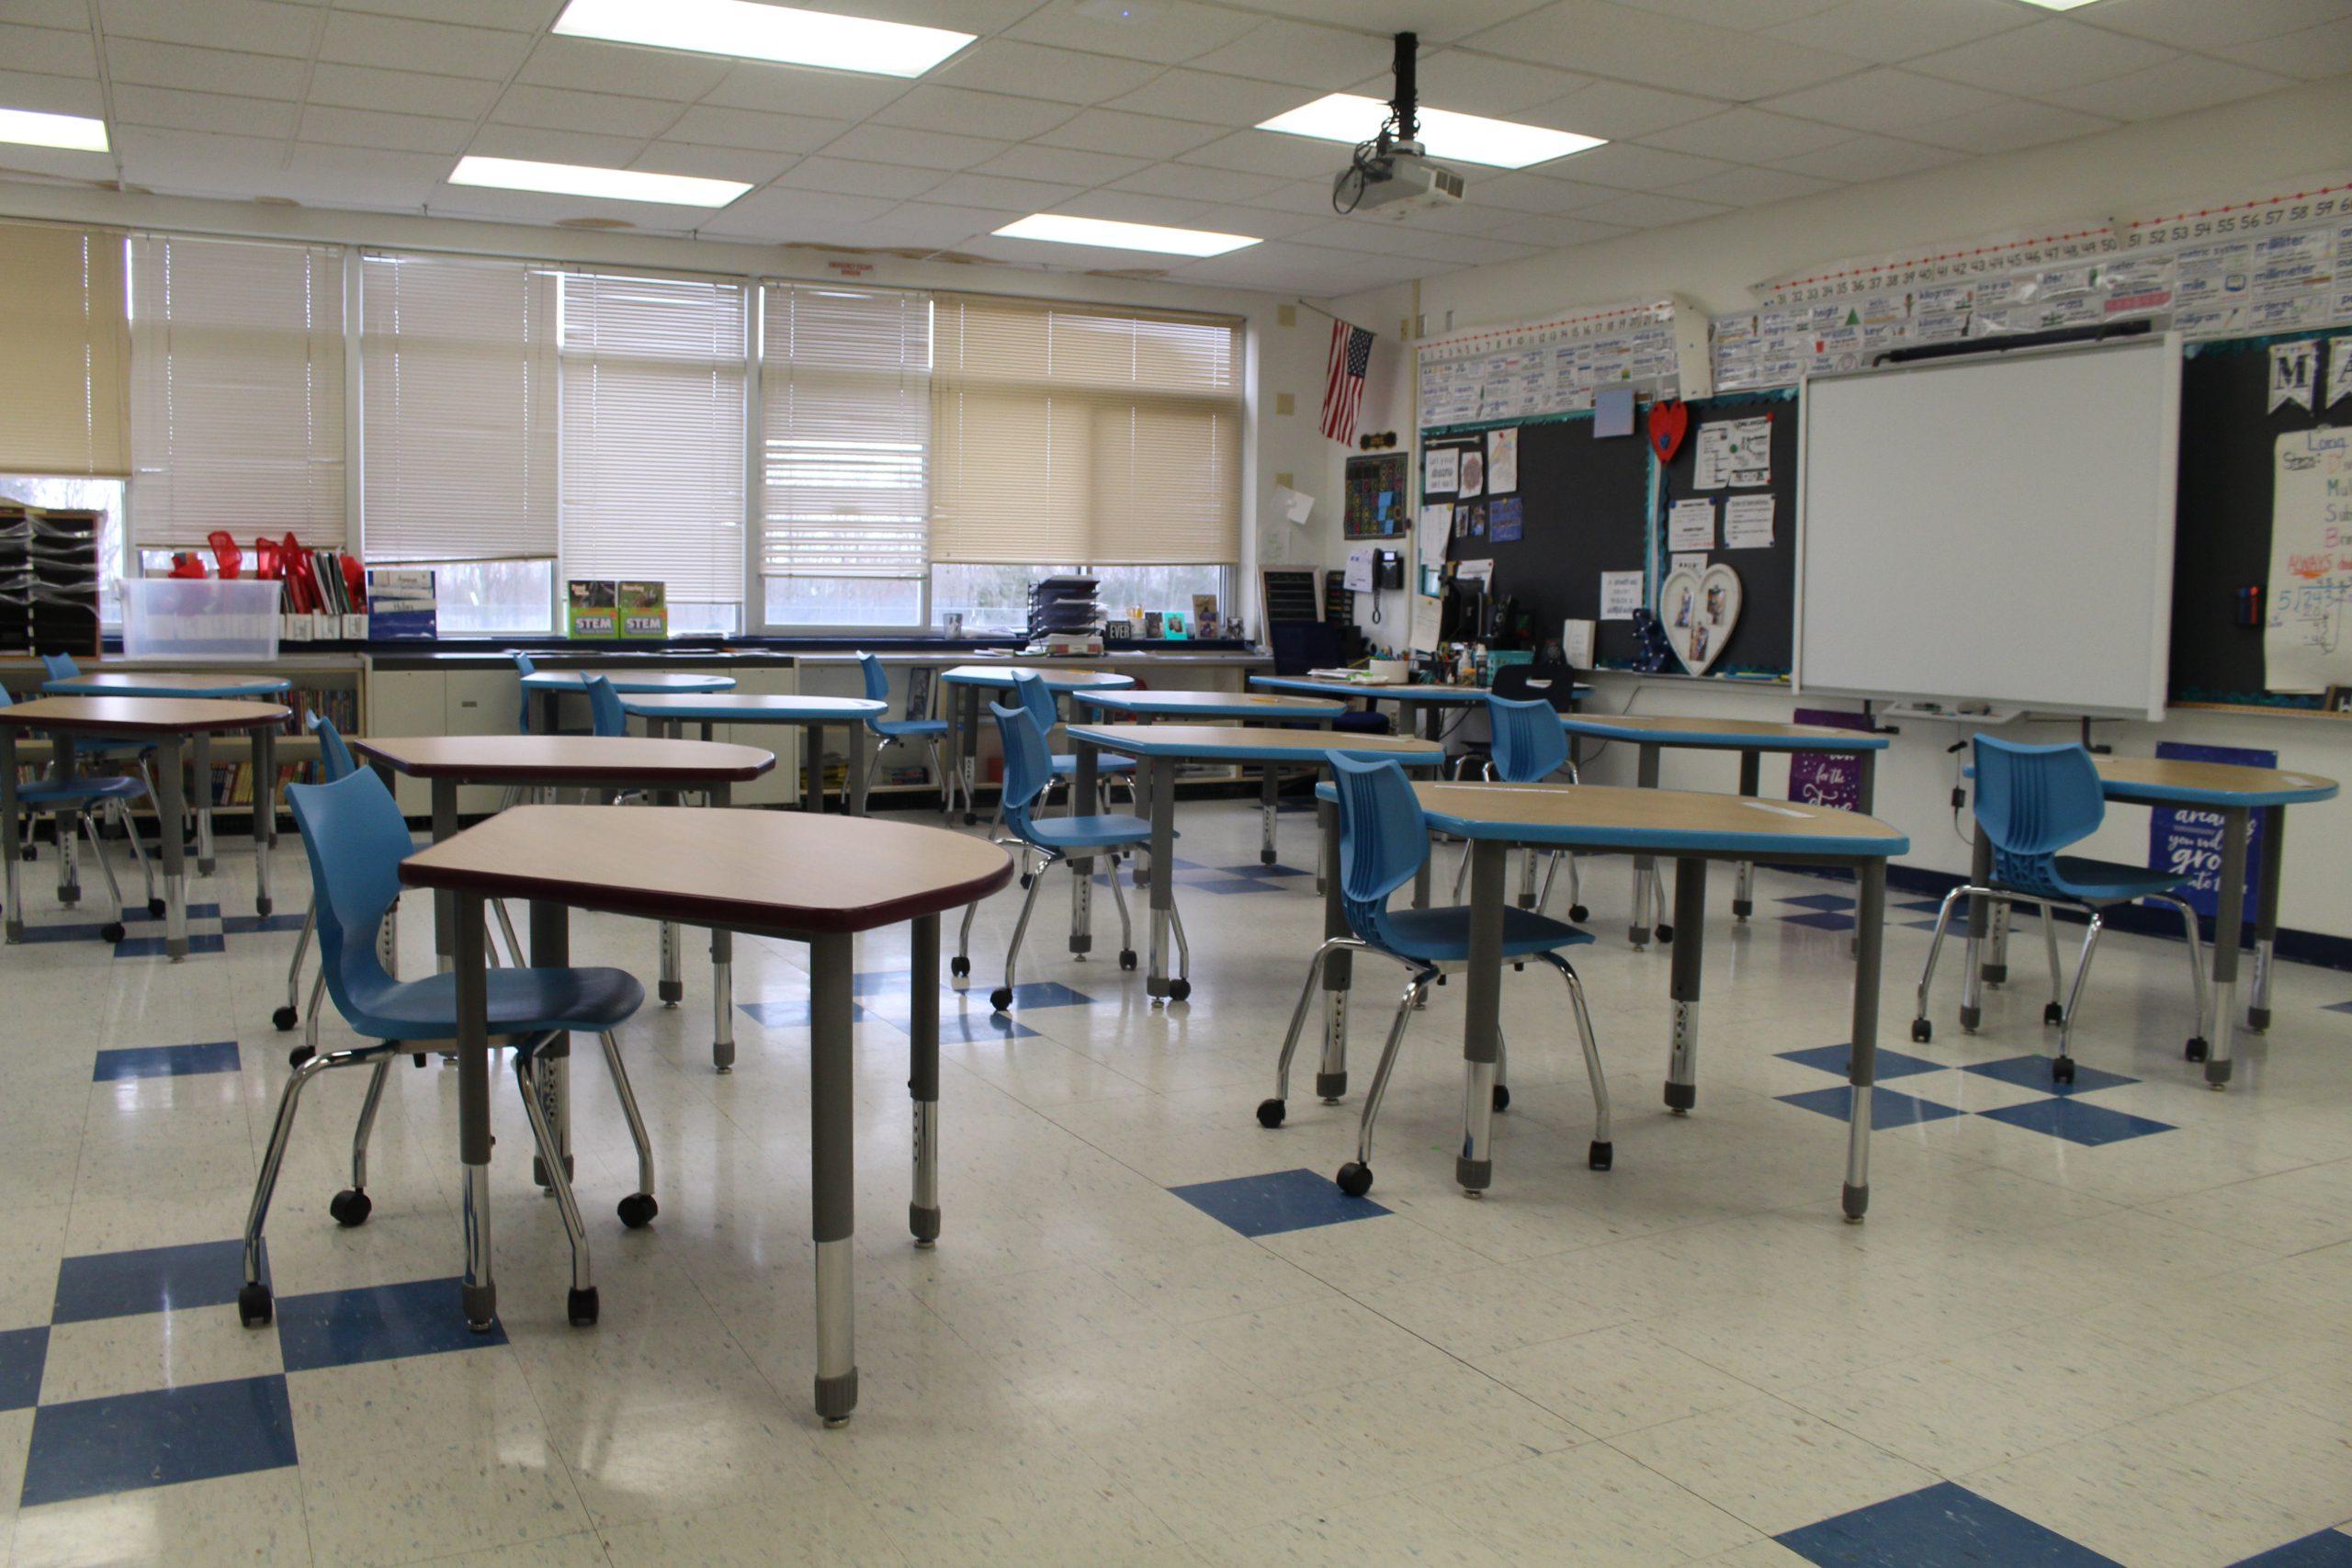 a group of crescent shaped desks